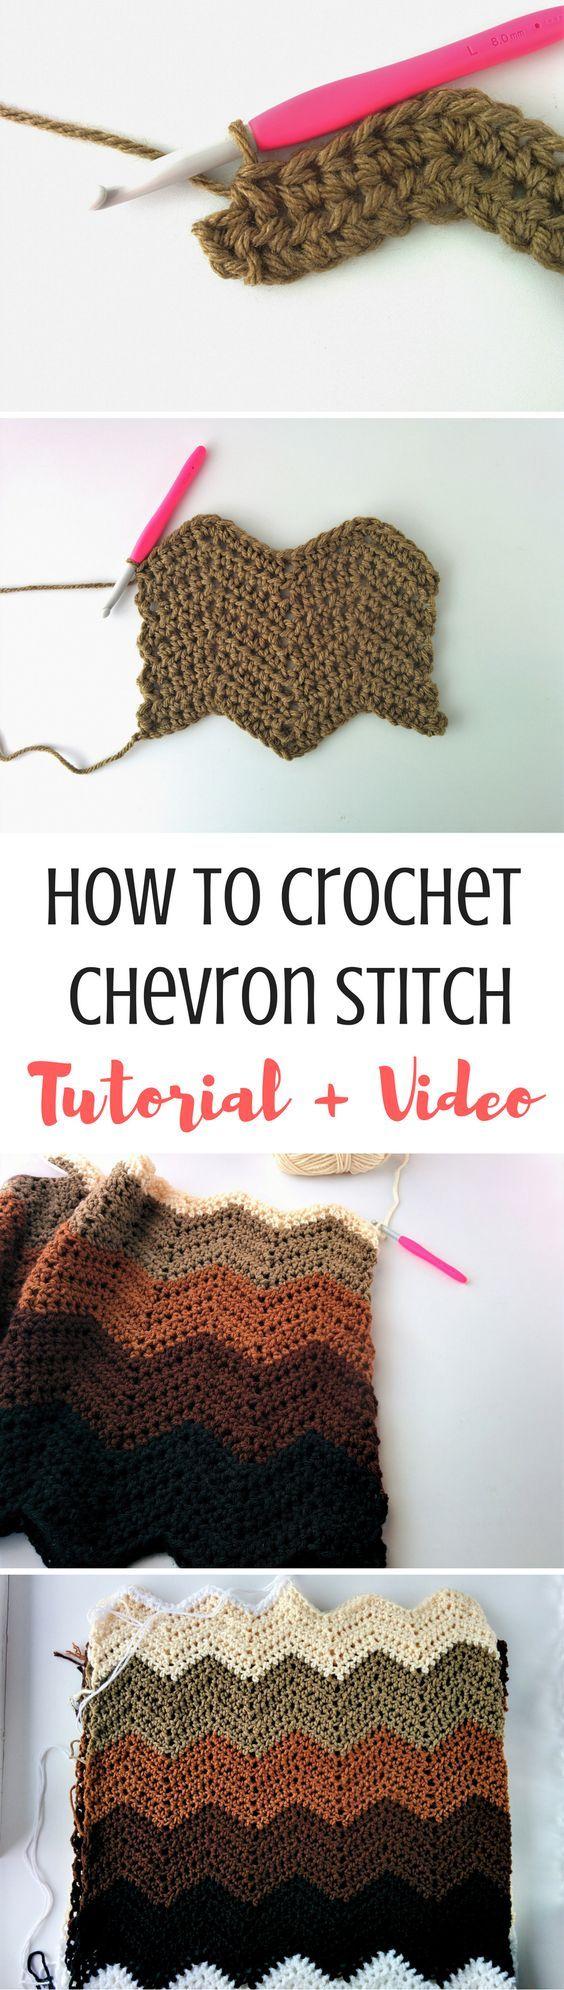 How to Crochet Chevron Stitch [Video + Written] | Tejido, Sombreros ...